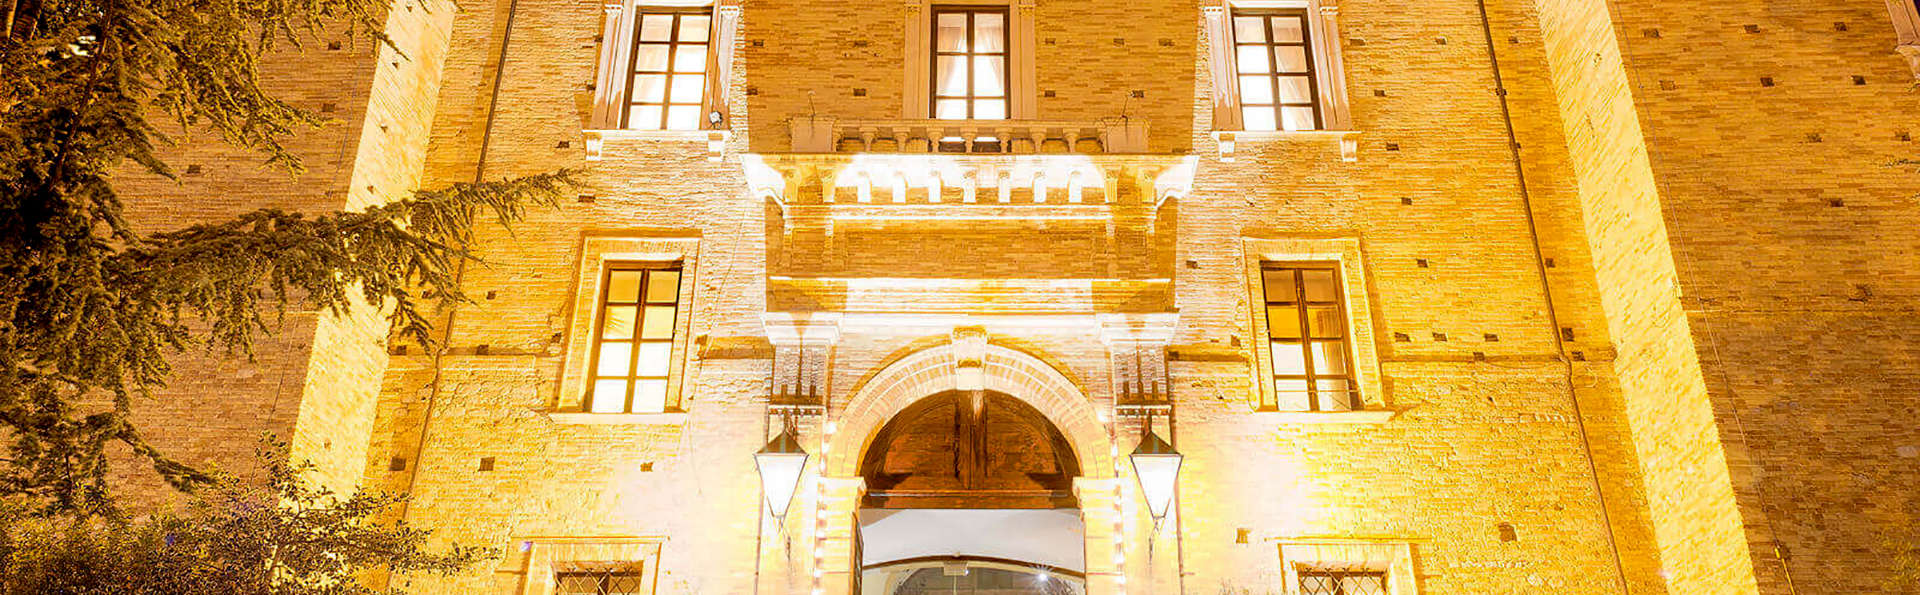 Castello Chiola Hotel - Edit_Front2.jpg